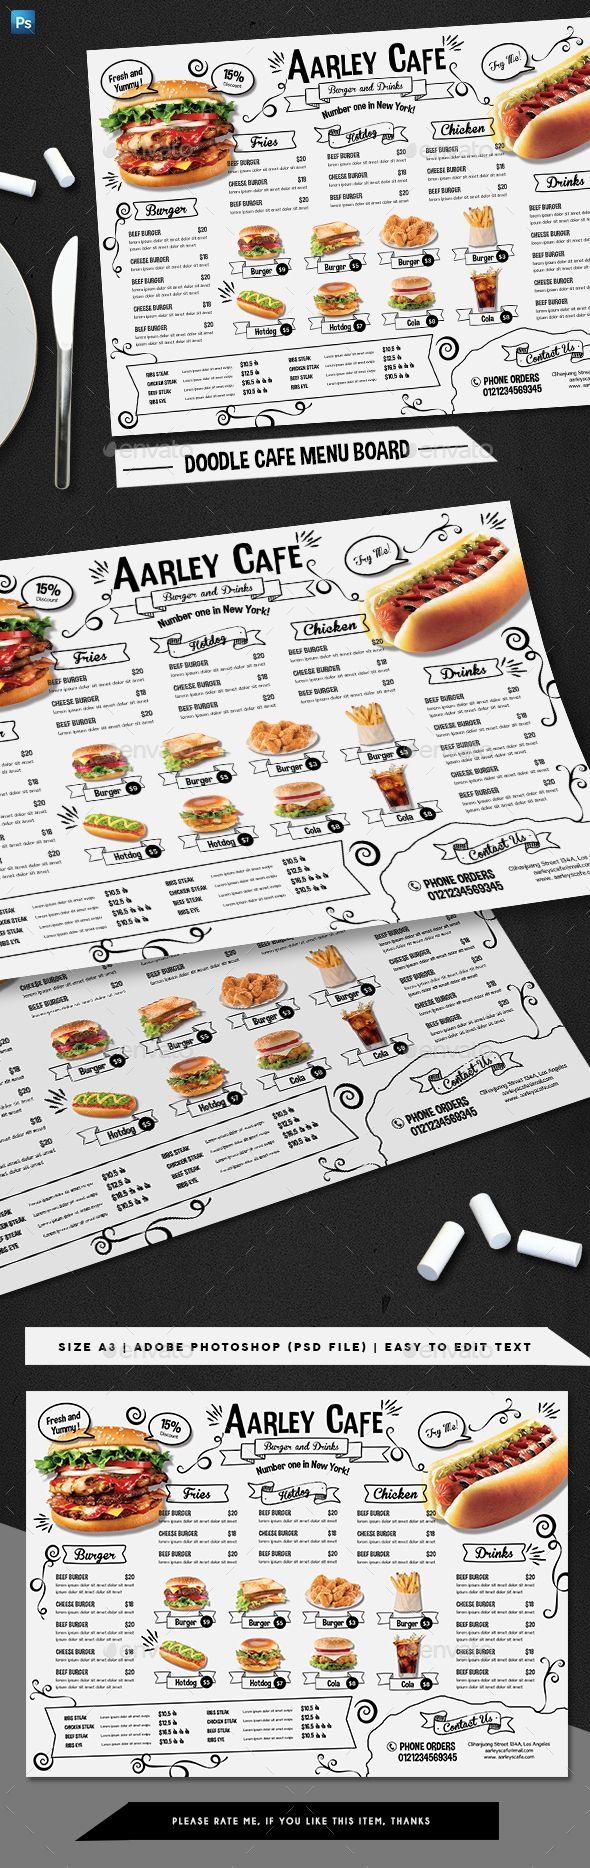 Doodle Cafe Menu Board — Photoshop PSD #elegant #flyer • Available here ➝ https://graphicriver.net/item/doodle-cafe-menu-board/20813314?ref=pxcr